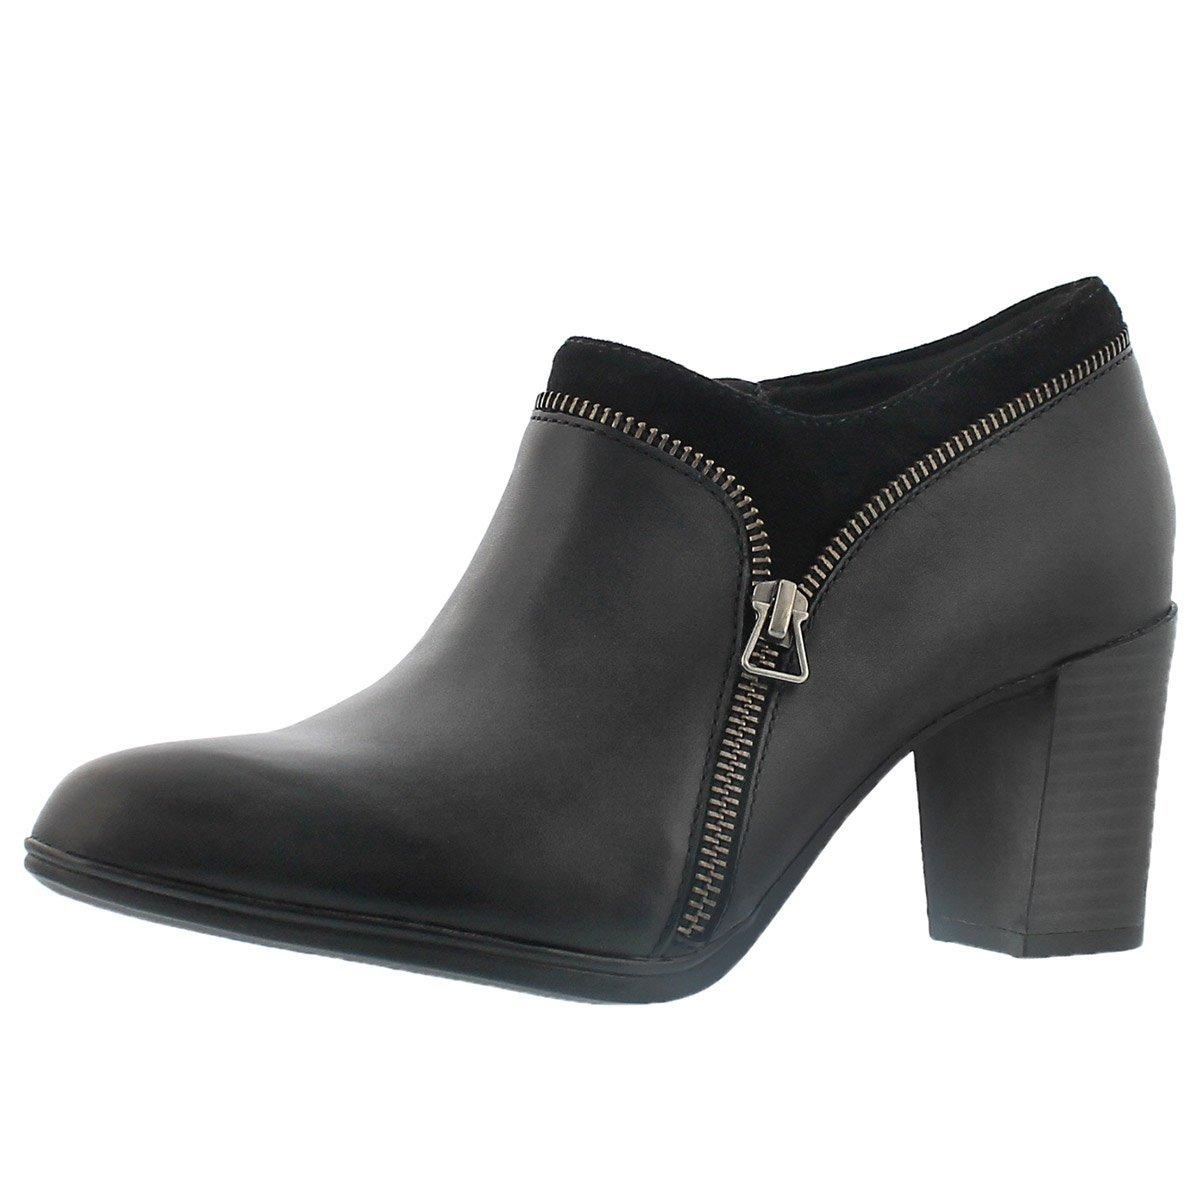 Clarks Women's Araya Morgan Bootie B0195QLSI2 5.5 B(M) US|Black Leather/Suede Combo